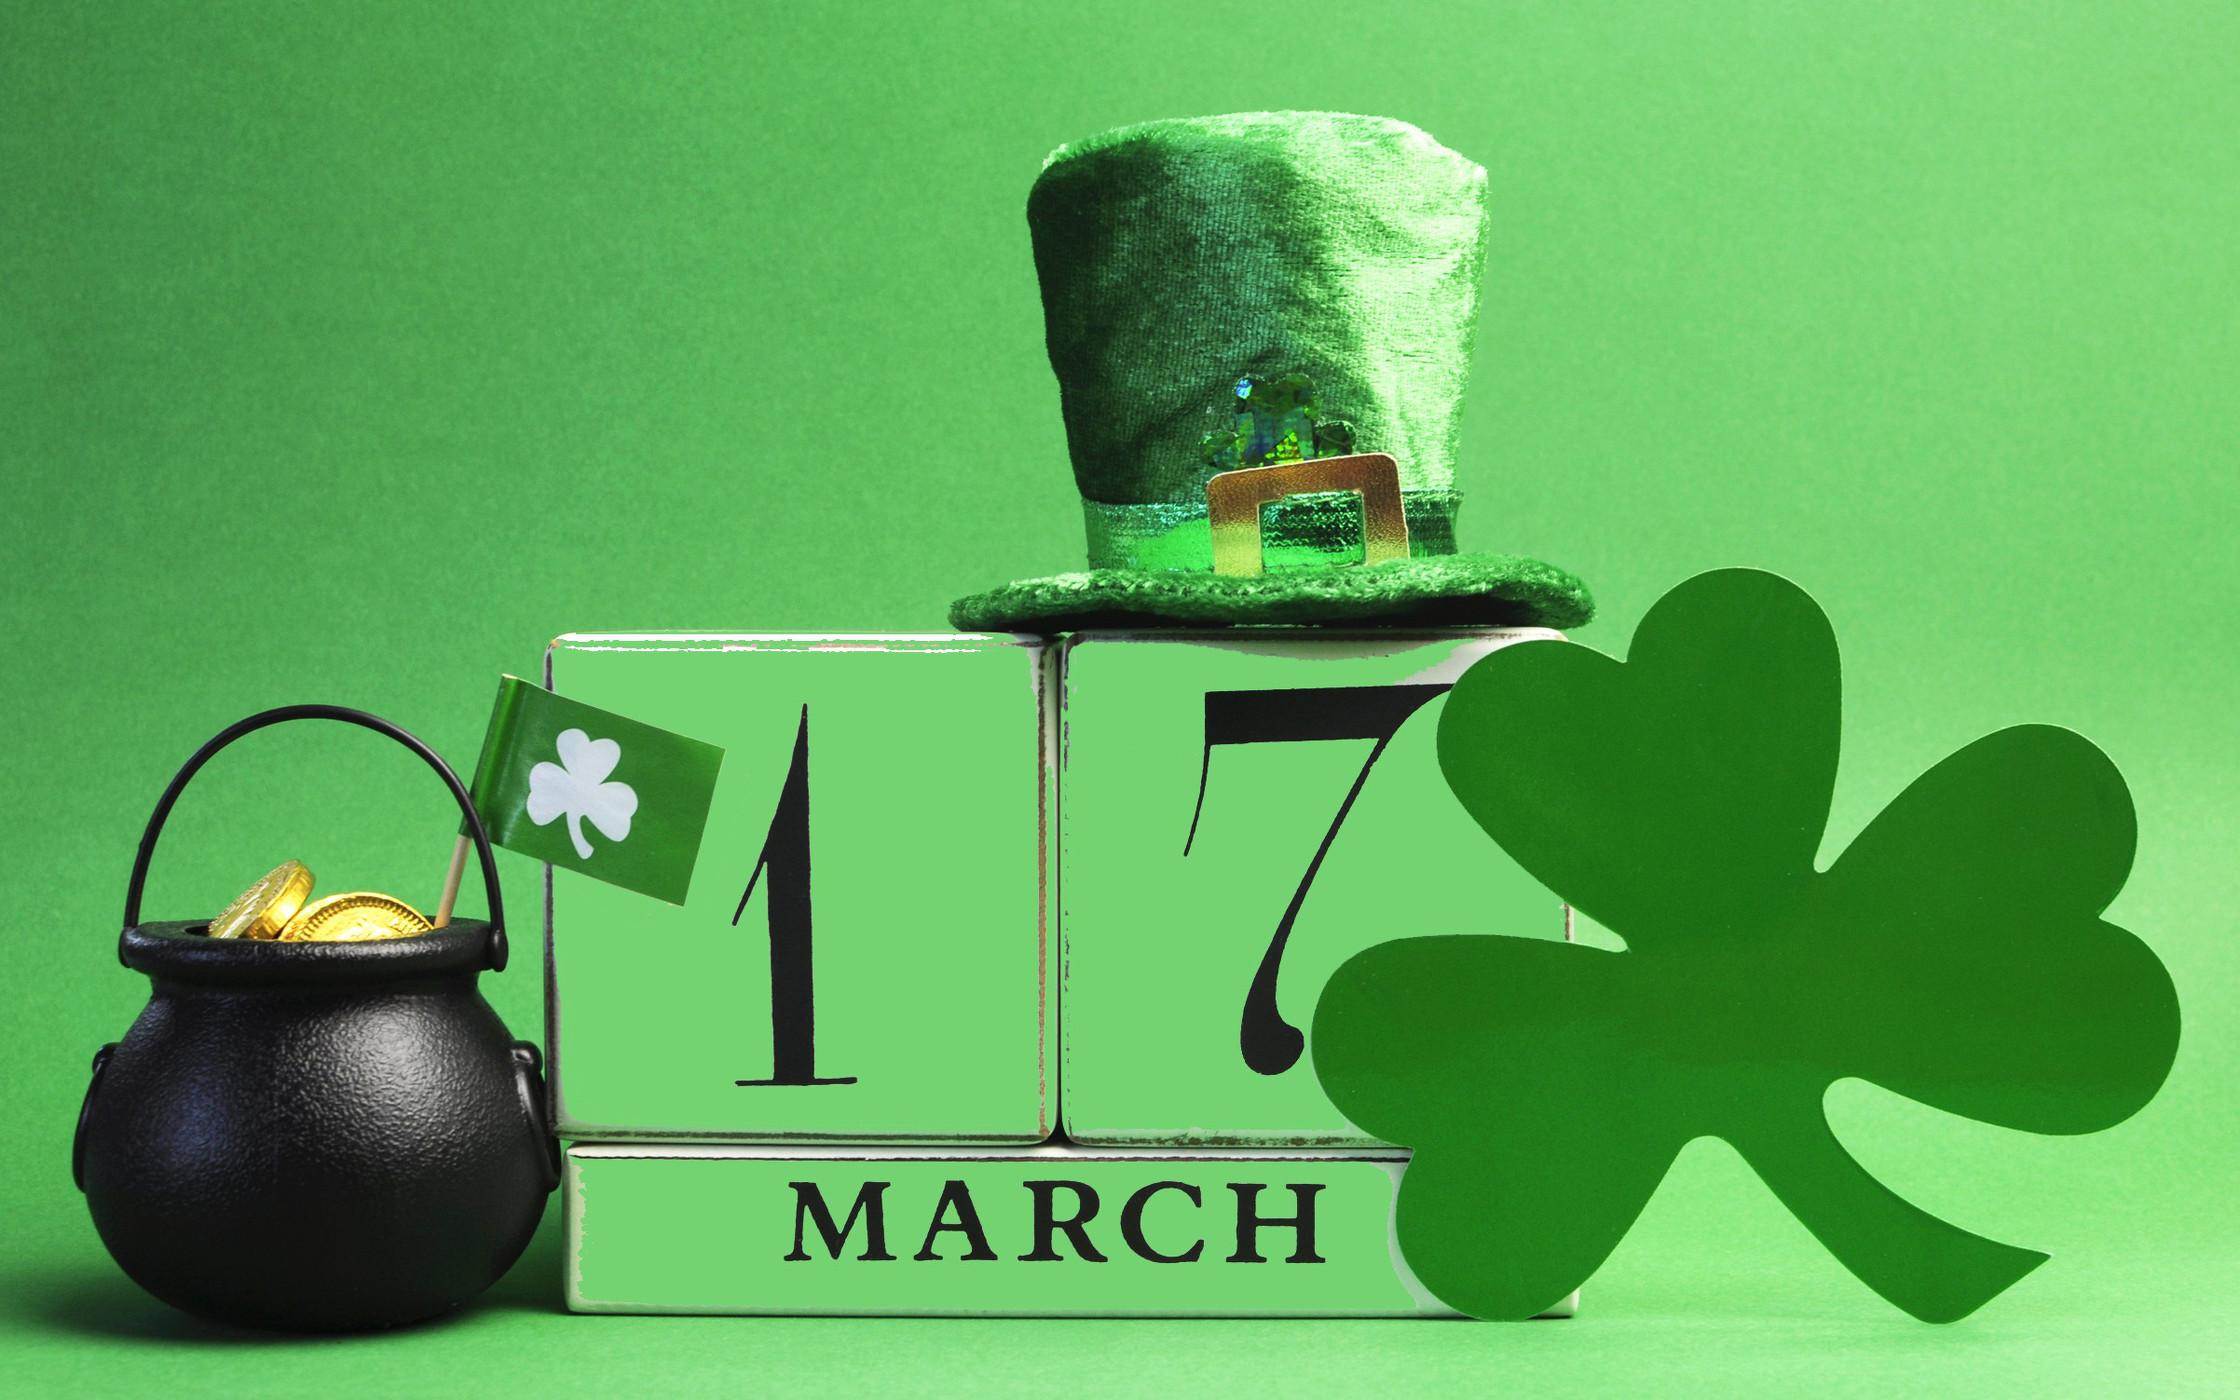 Free 3d St Patricks Day Wallpaper